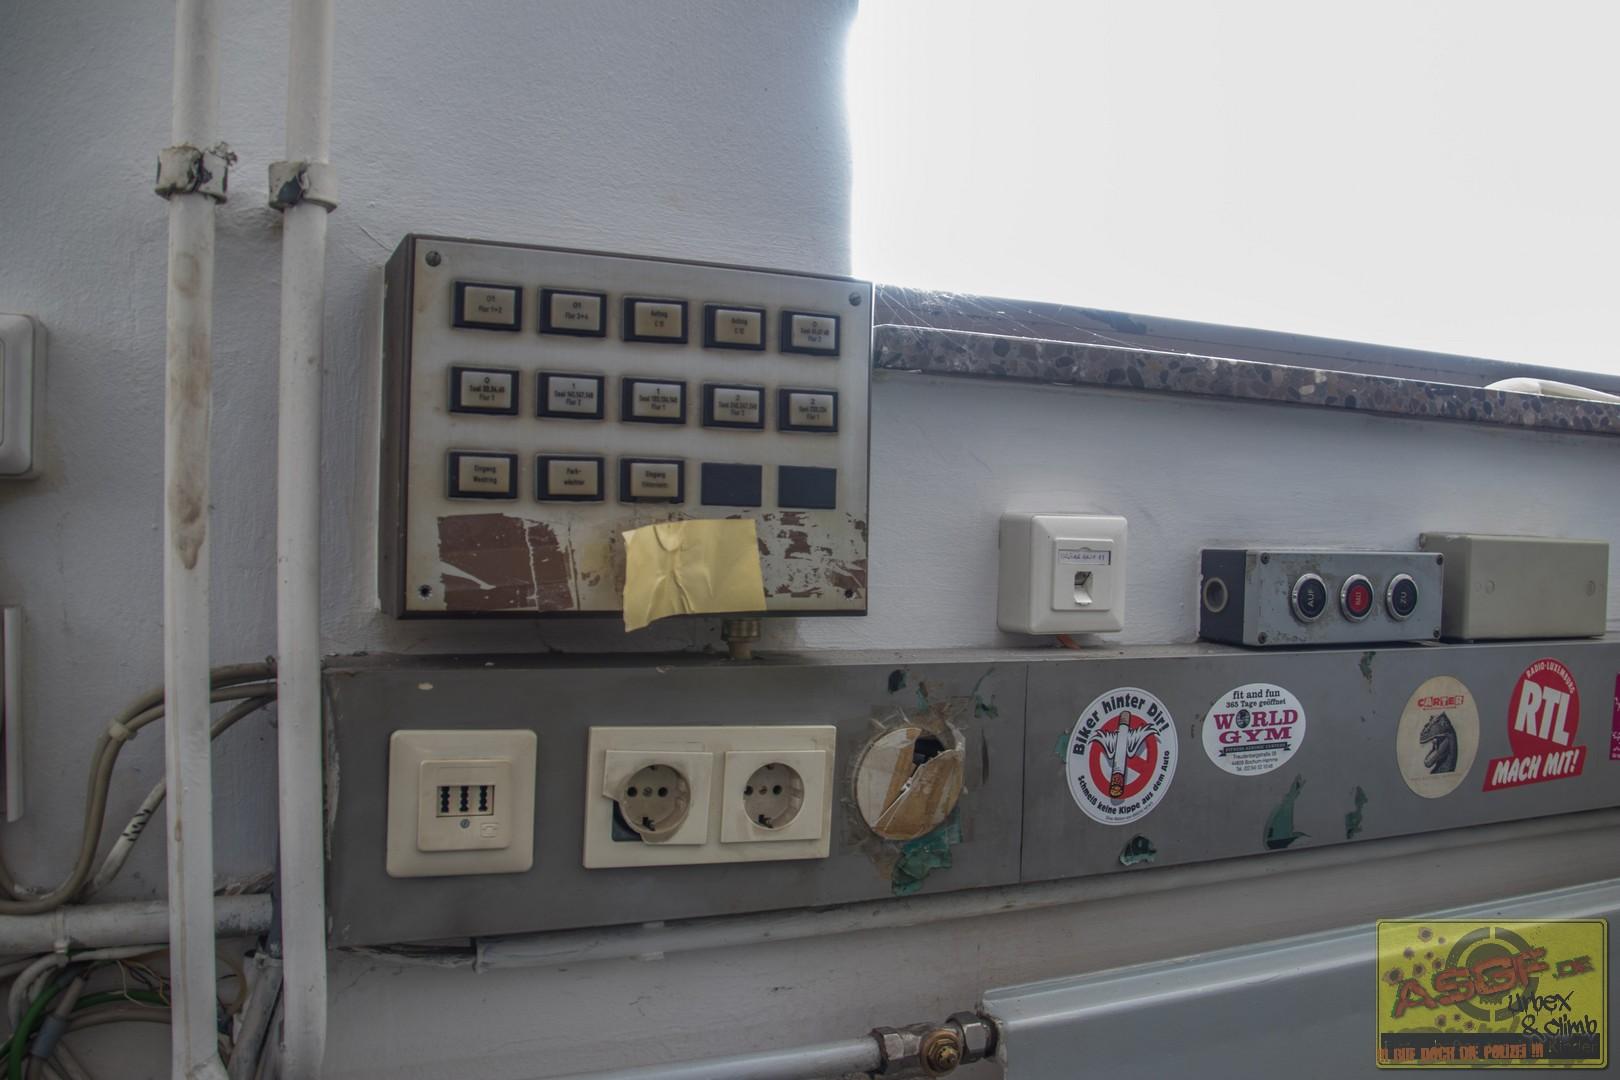 Bo-LGT2-260818-8